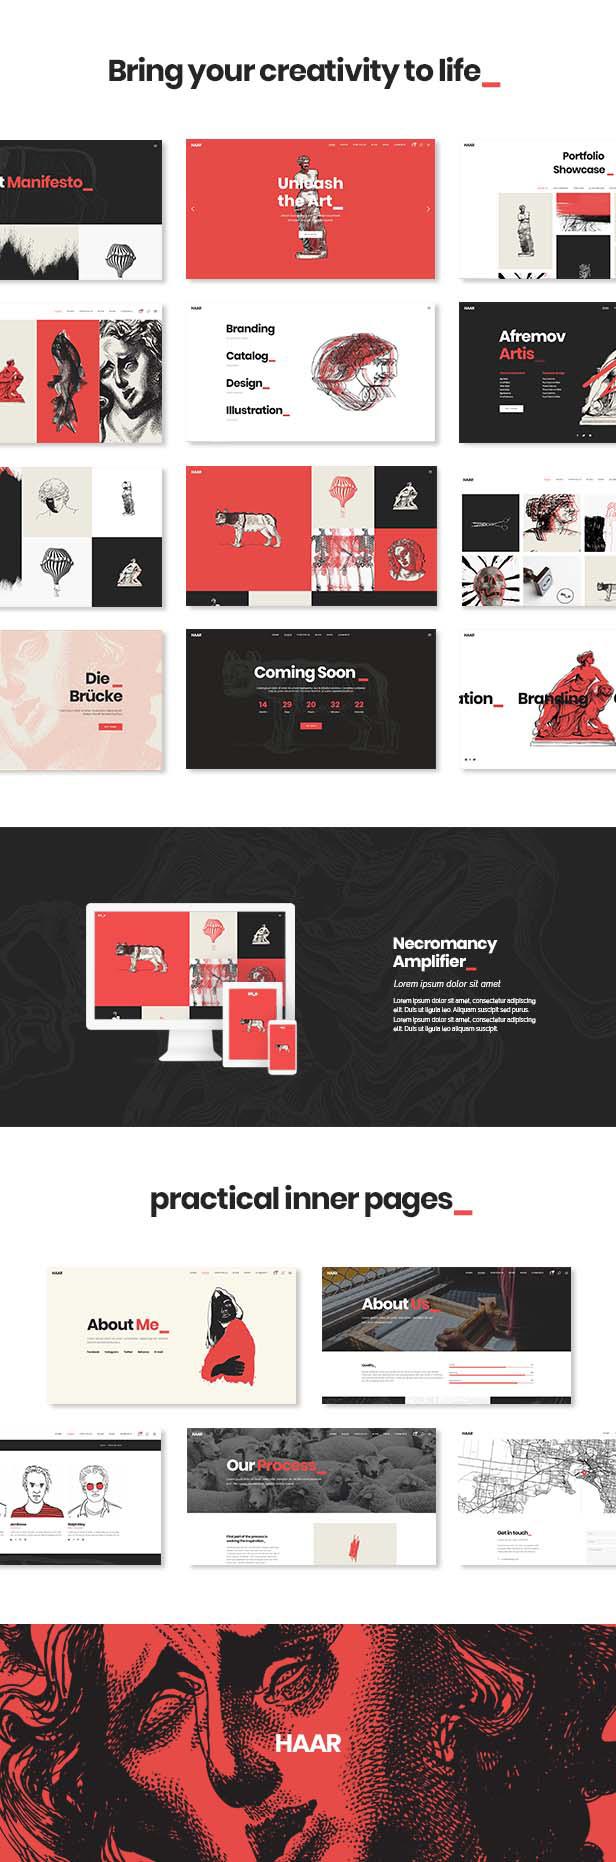 WordPress theme Haar - A Portfolio Theme for Designers, Artists and Illustrators (Portfolio)